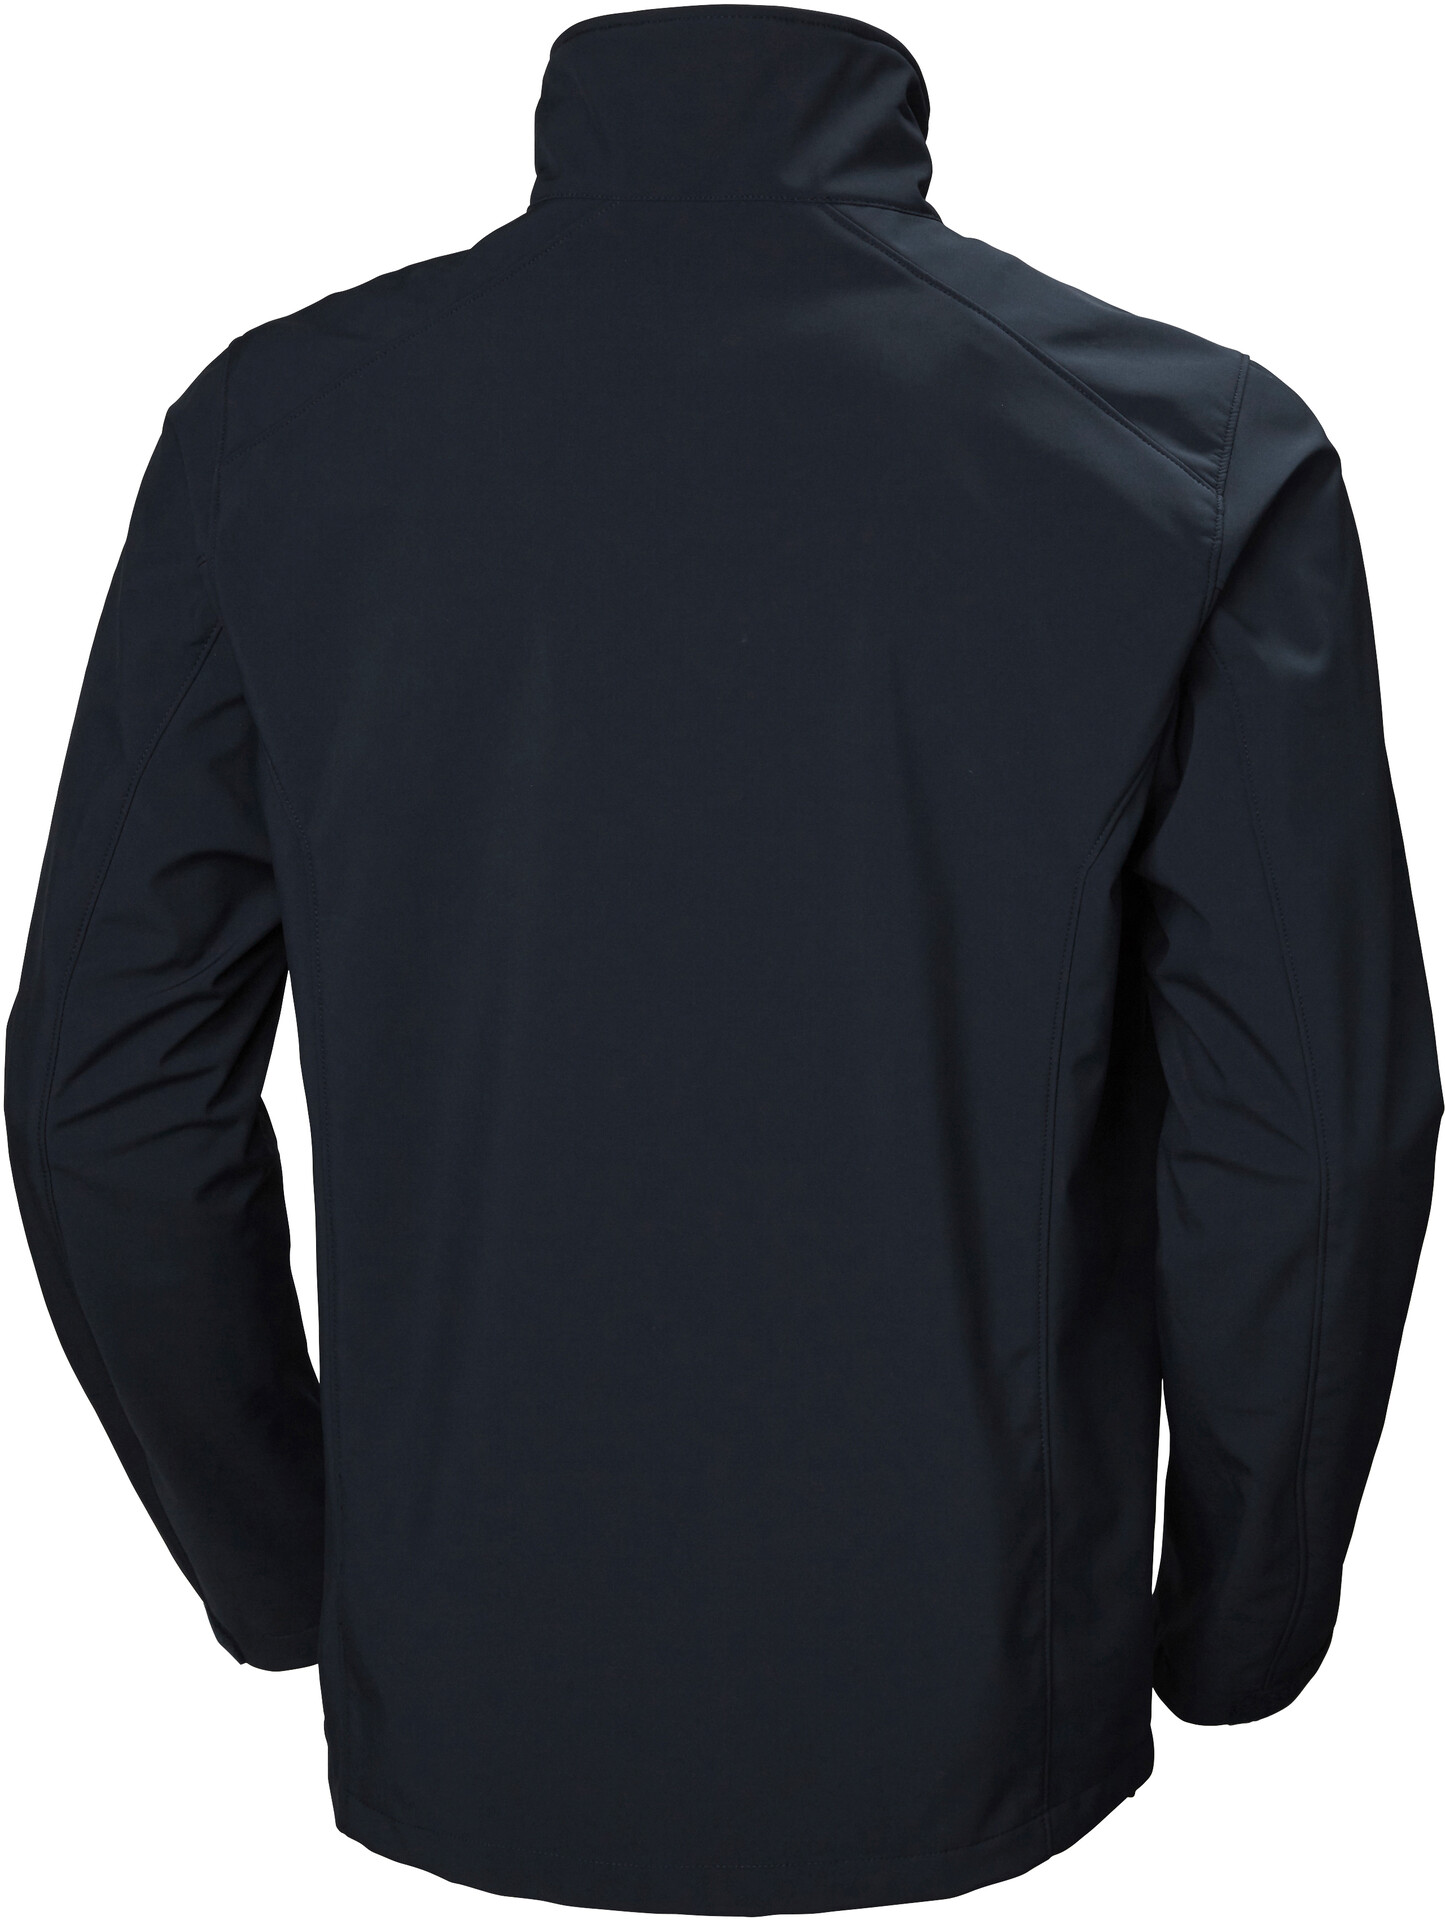 Helly Hansen Herren Jacke Paramount Softshell Jacket